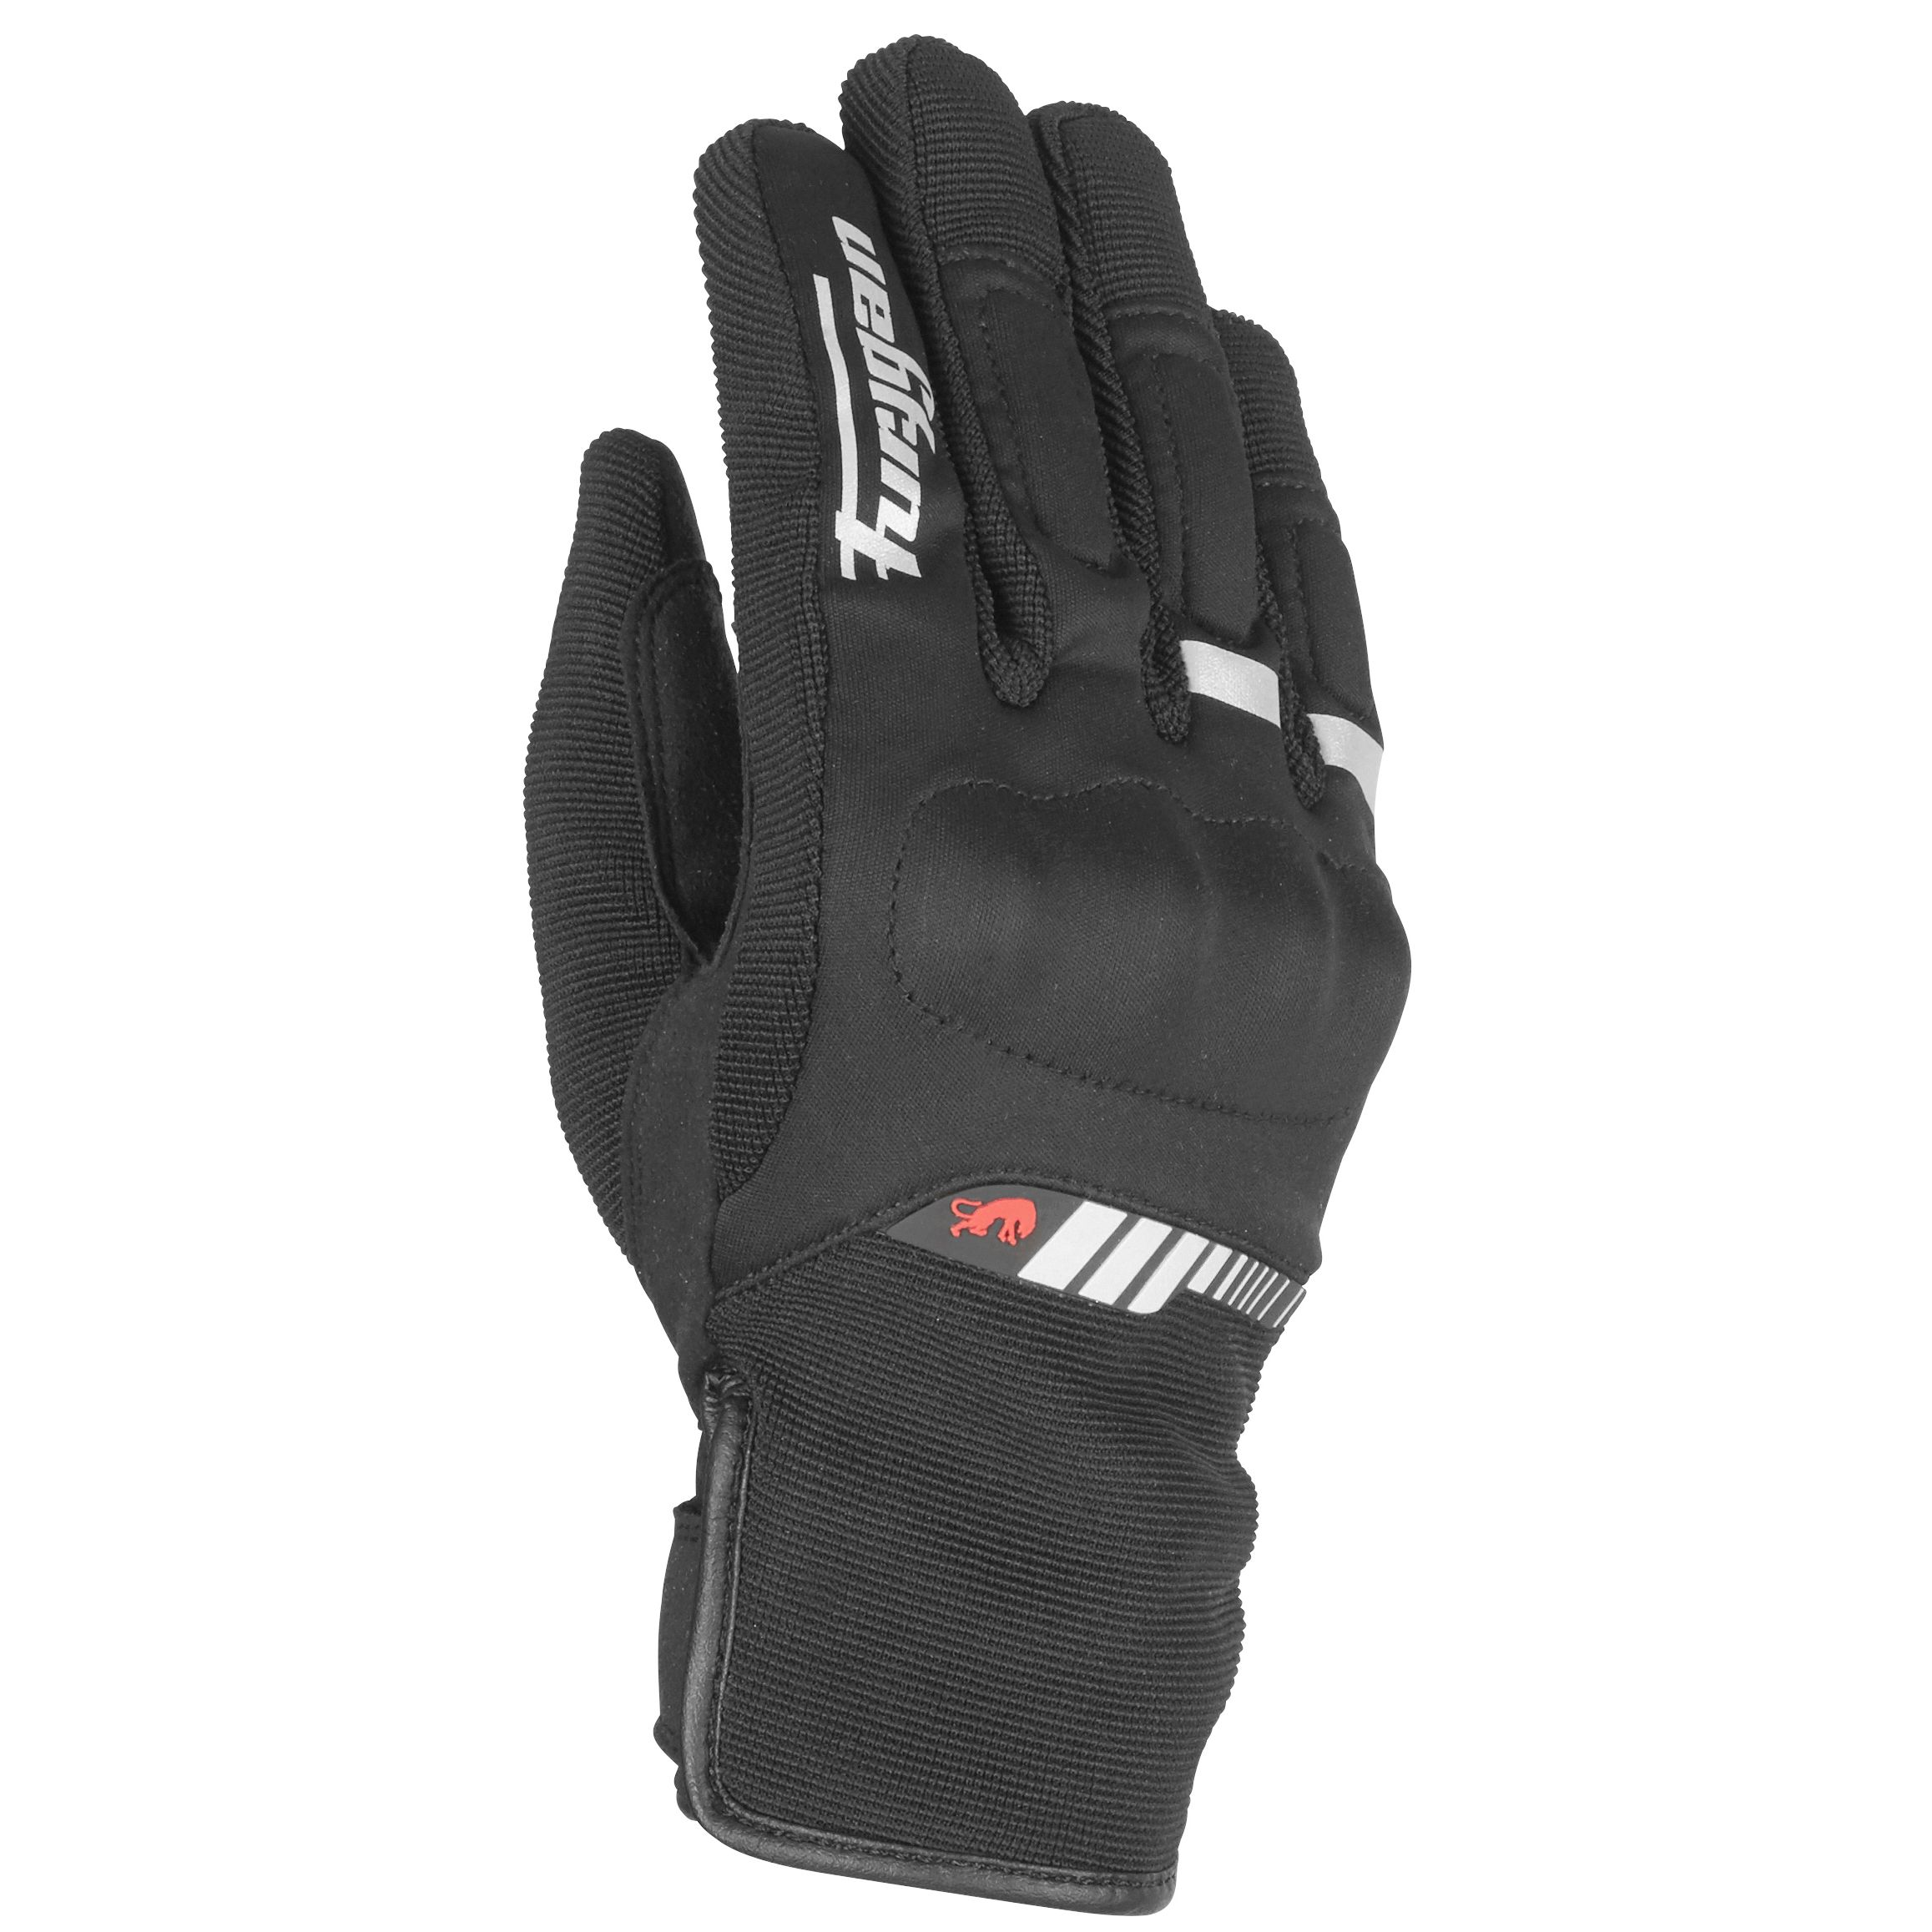 gants furygan jet all season lady gants moto. Black Bedroom Furniture Sets. Home Design Ideas